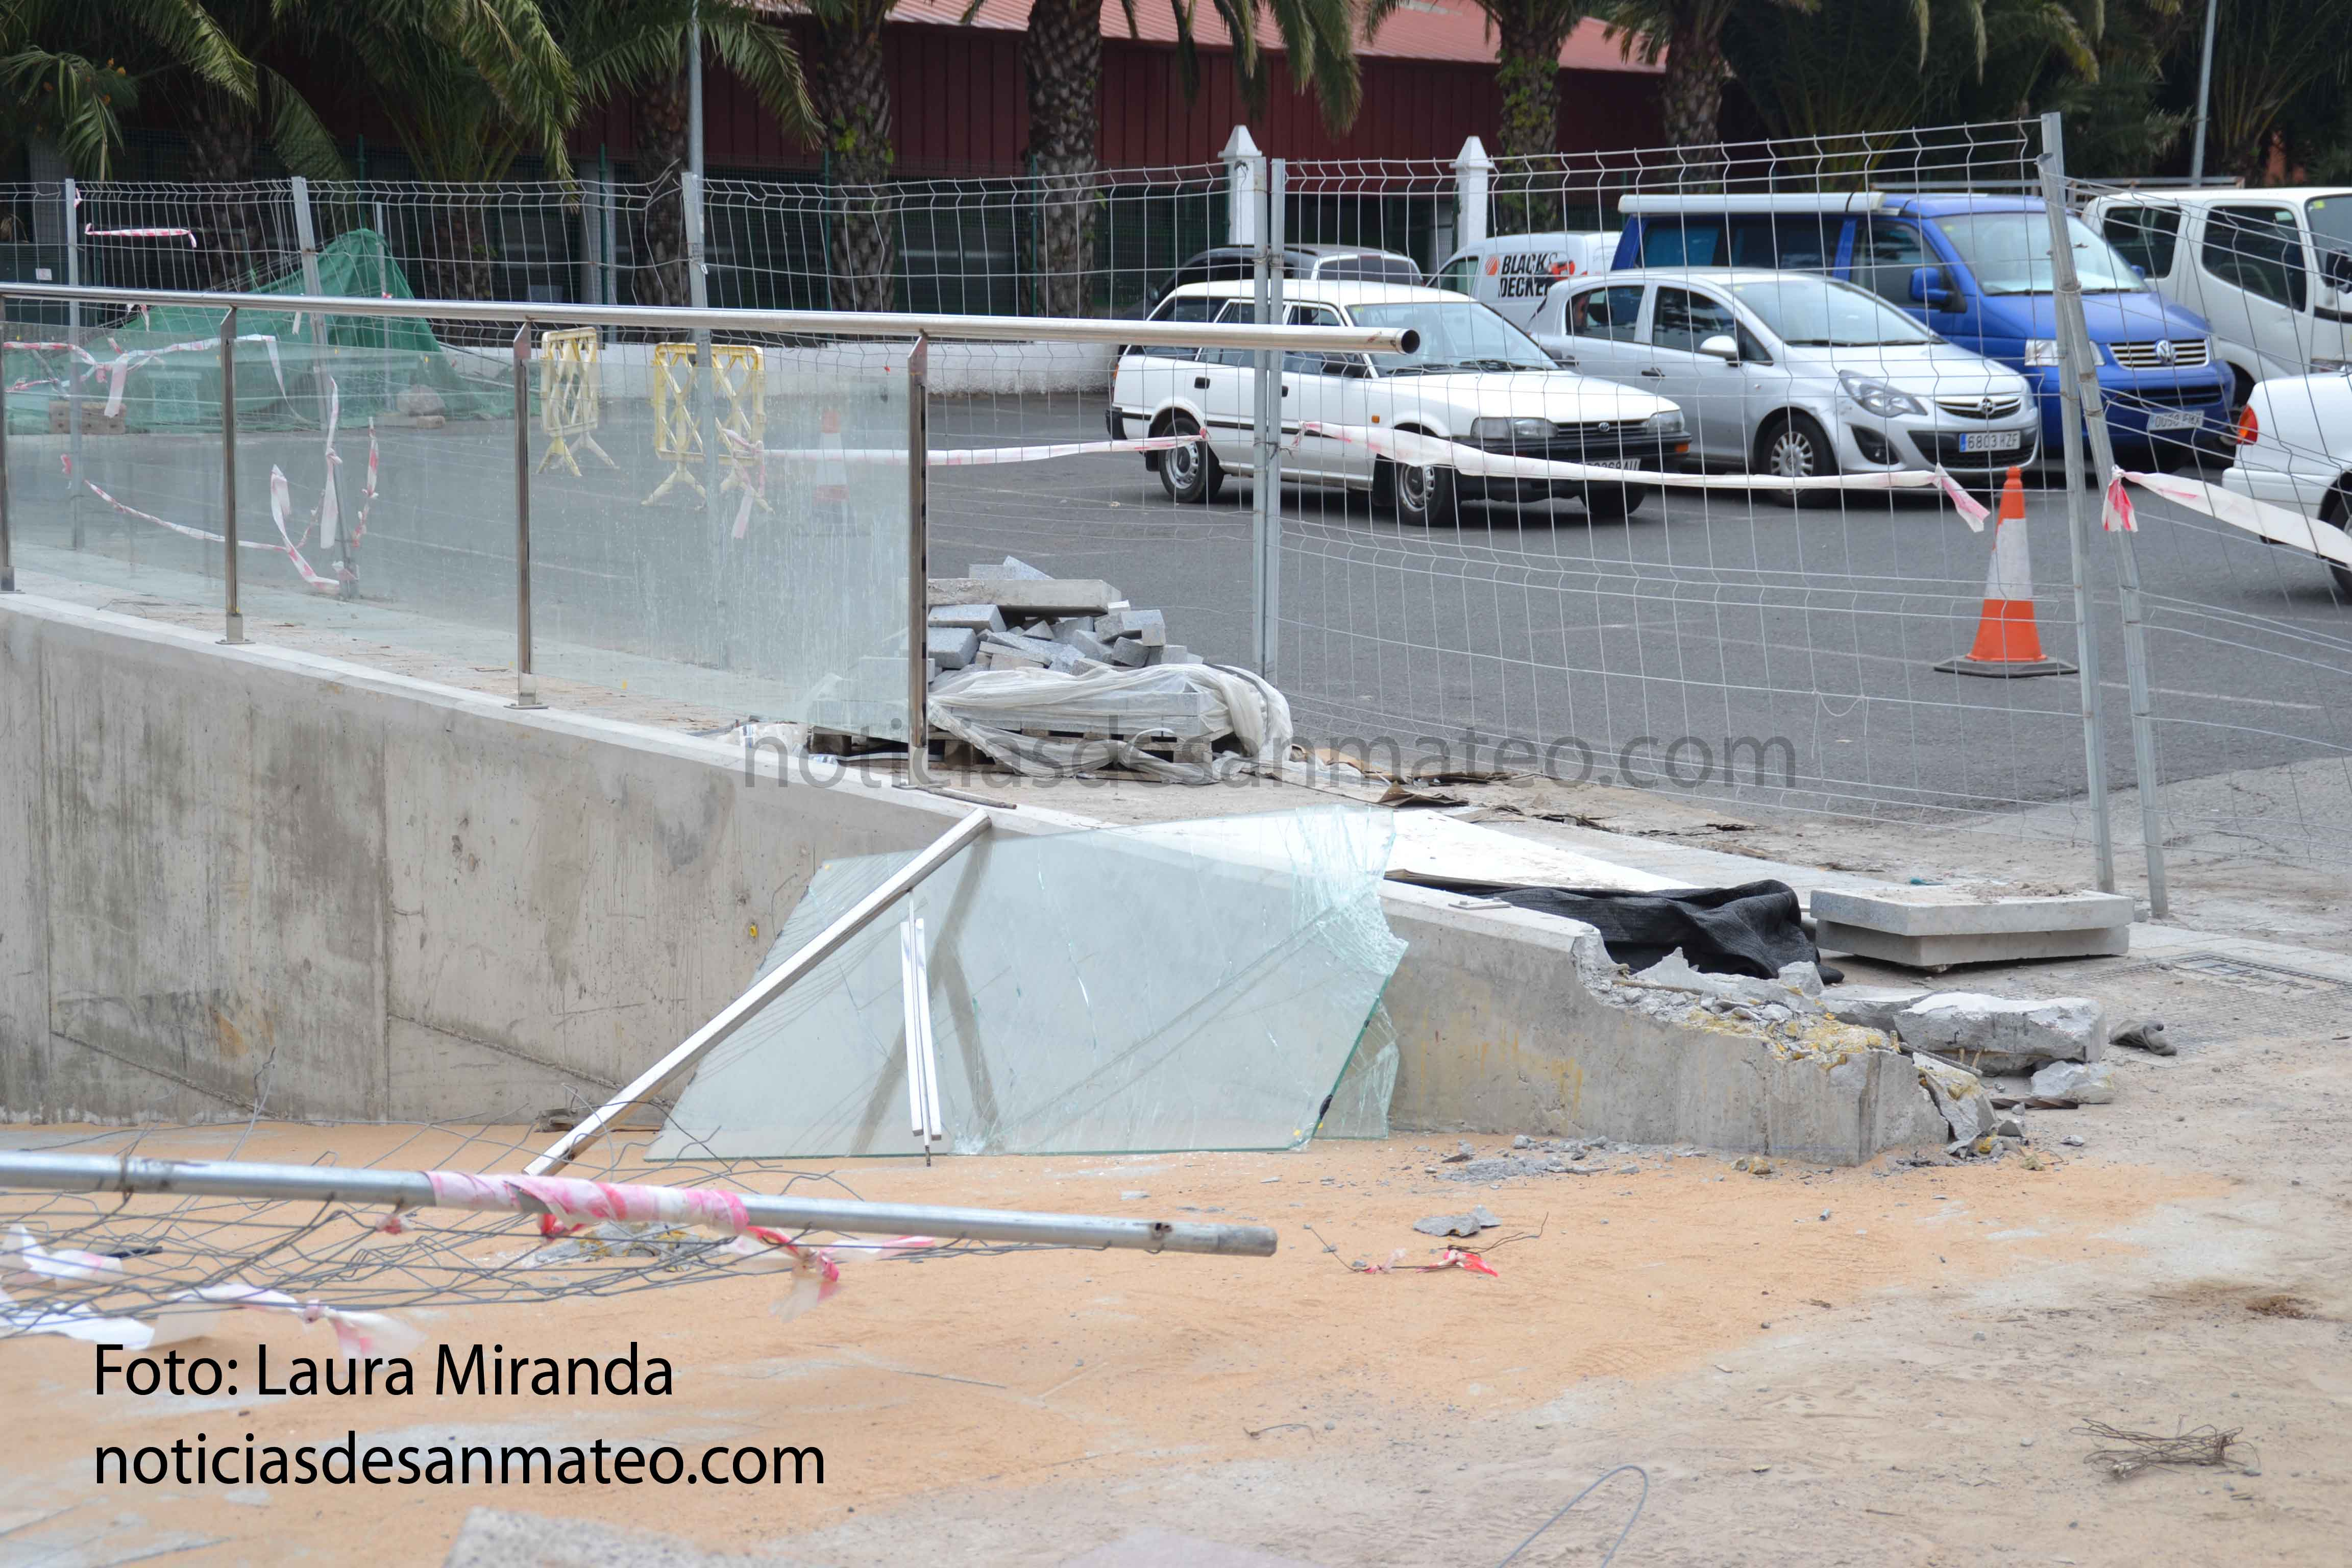 guagua se estrella contra la nueva obra del mercado 2 2 de marzo de 2017 Foto Laura Miranda